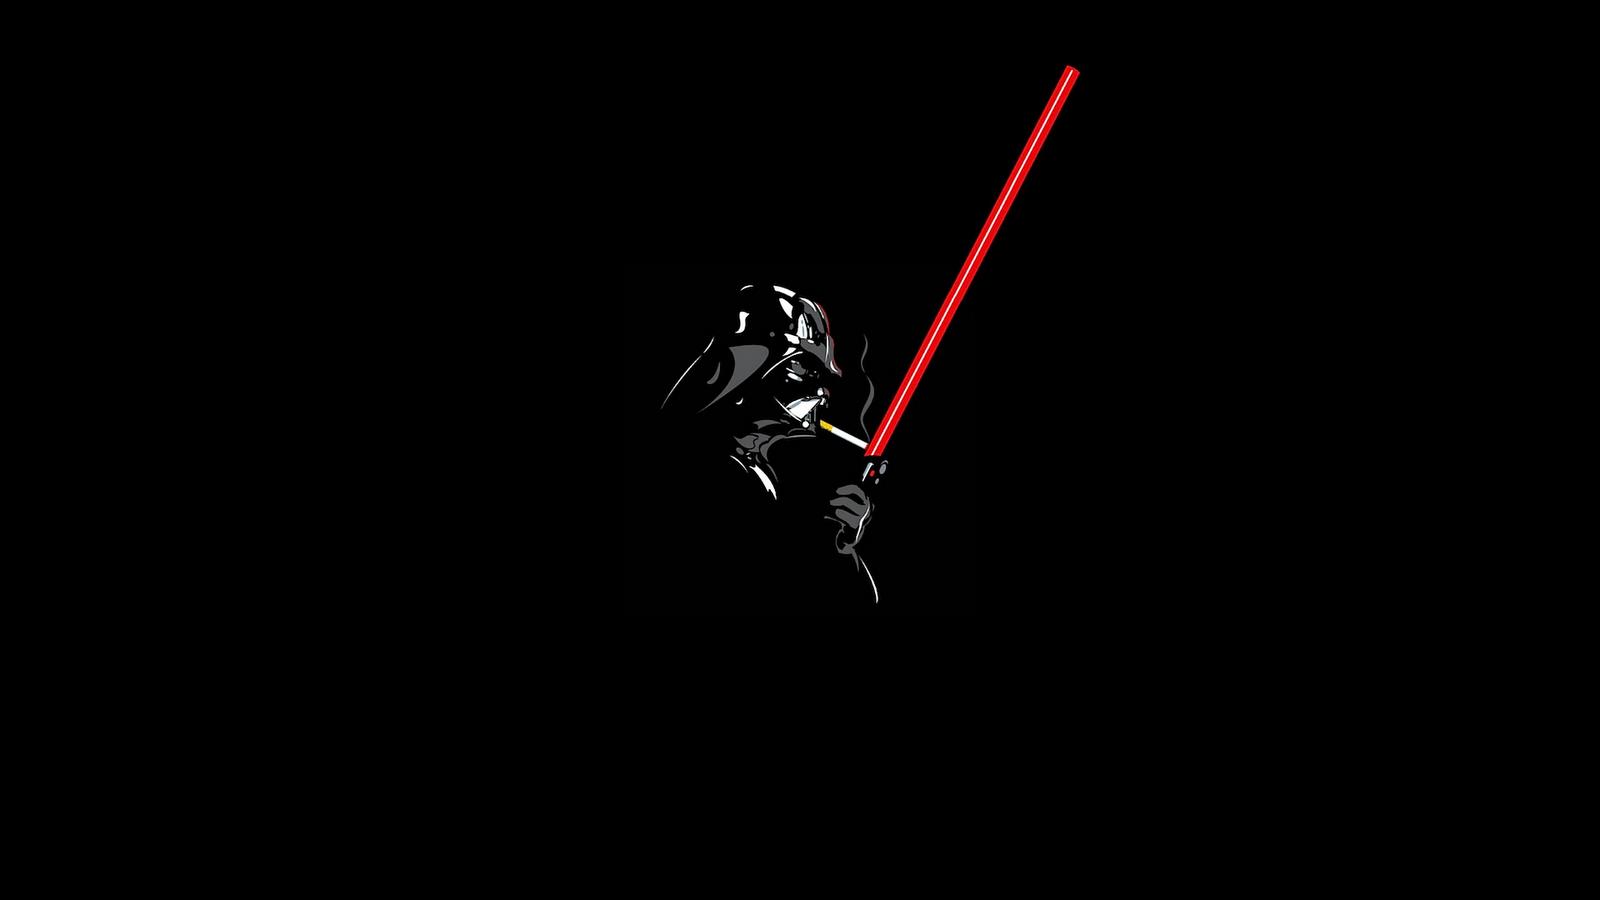 Cool Star Wars Wallpaper Download Best Desktop HD Wallpapers Images 1600x900